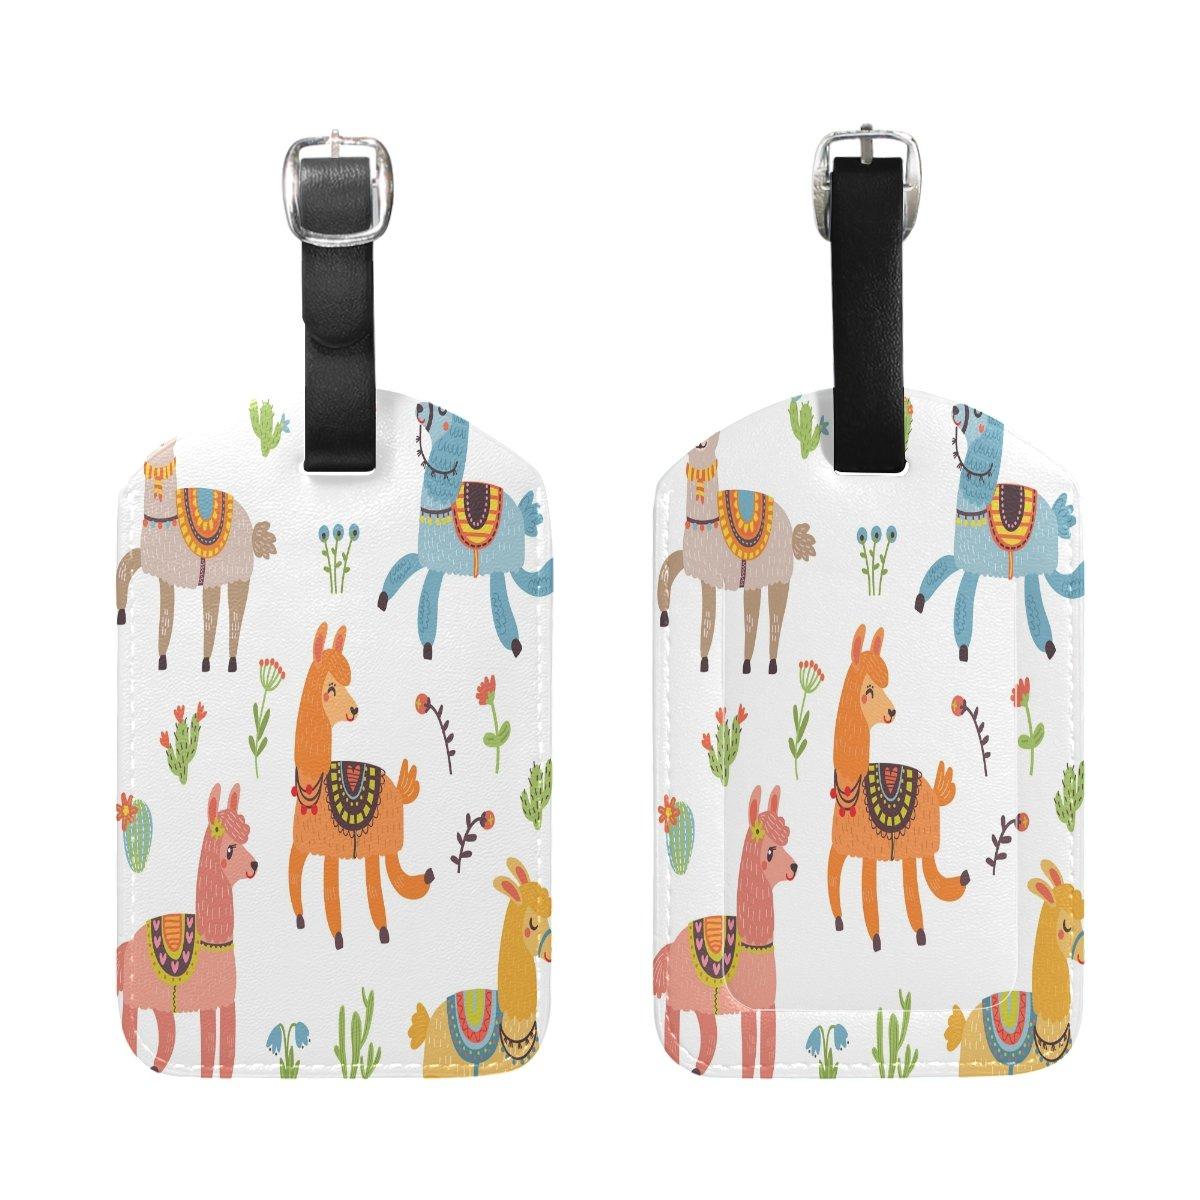 Saobao Travel Luggage Tag Colorful Alpaca PU Leather Baggage Suitcase Travel ID Bag Tag 1Pcs